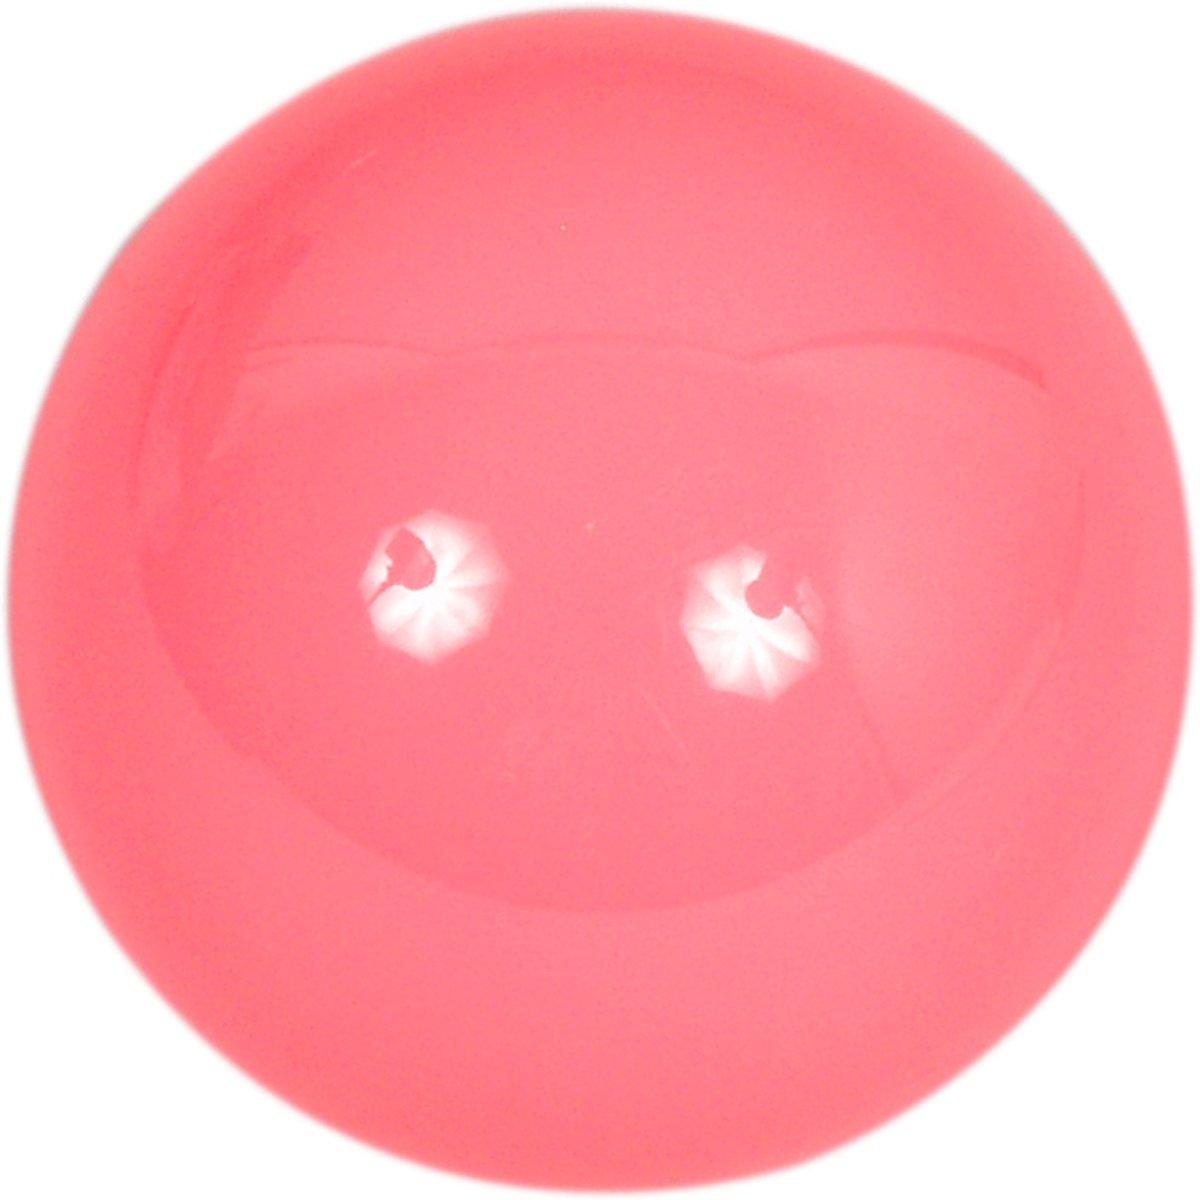 Snooker bal Aramith 52.4mm roze kopen